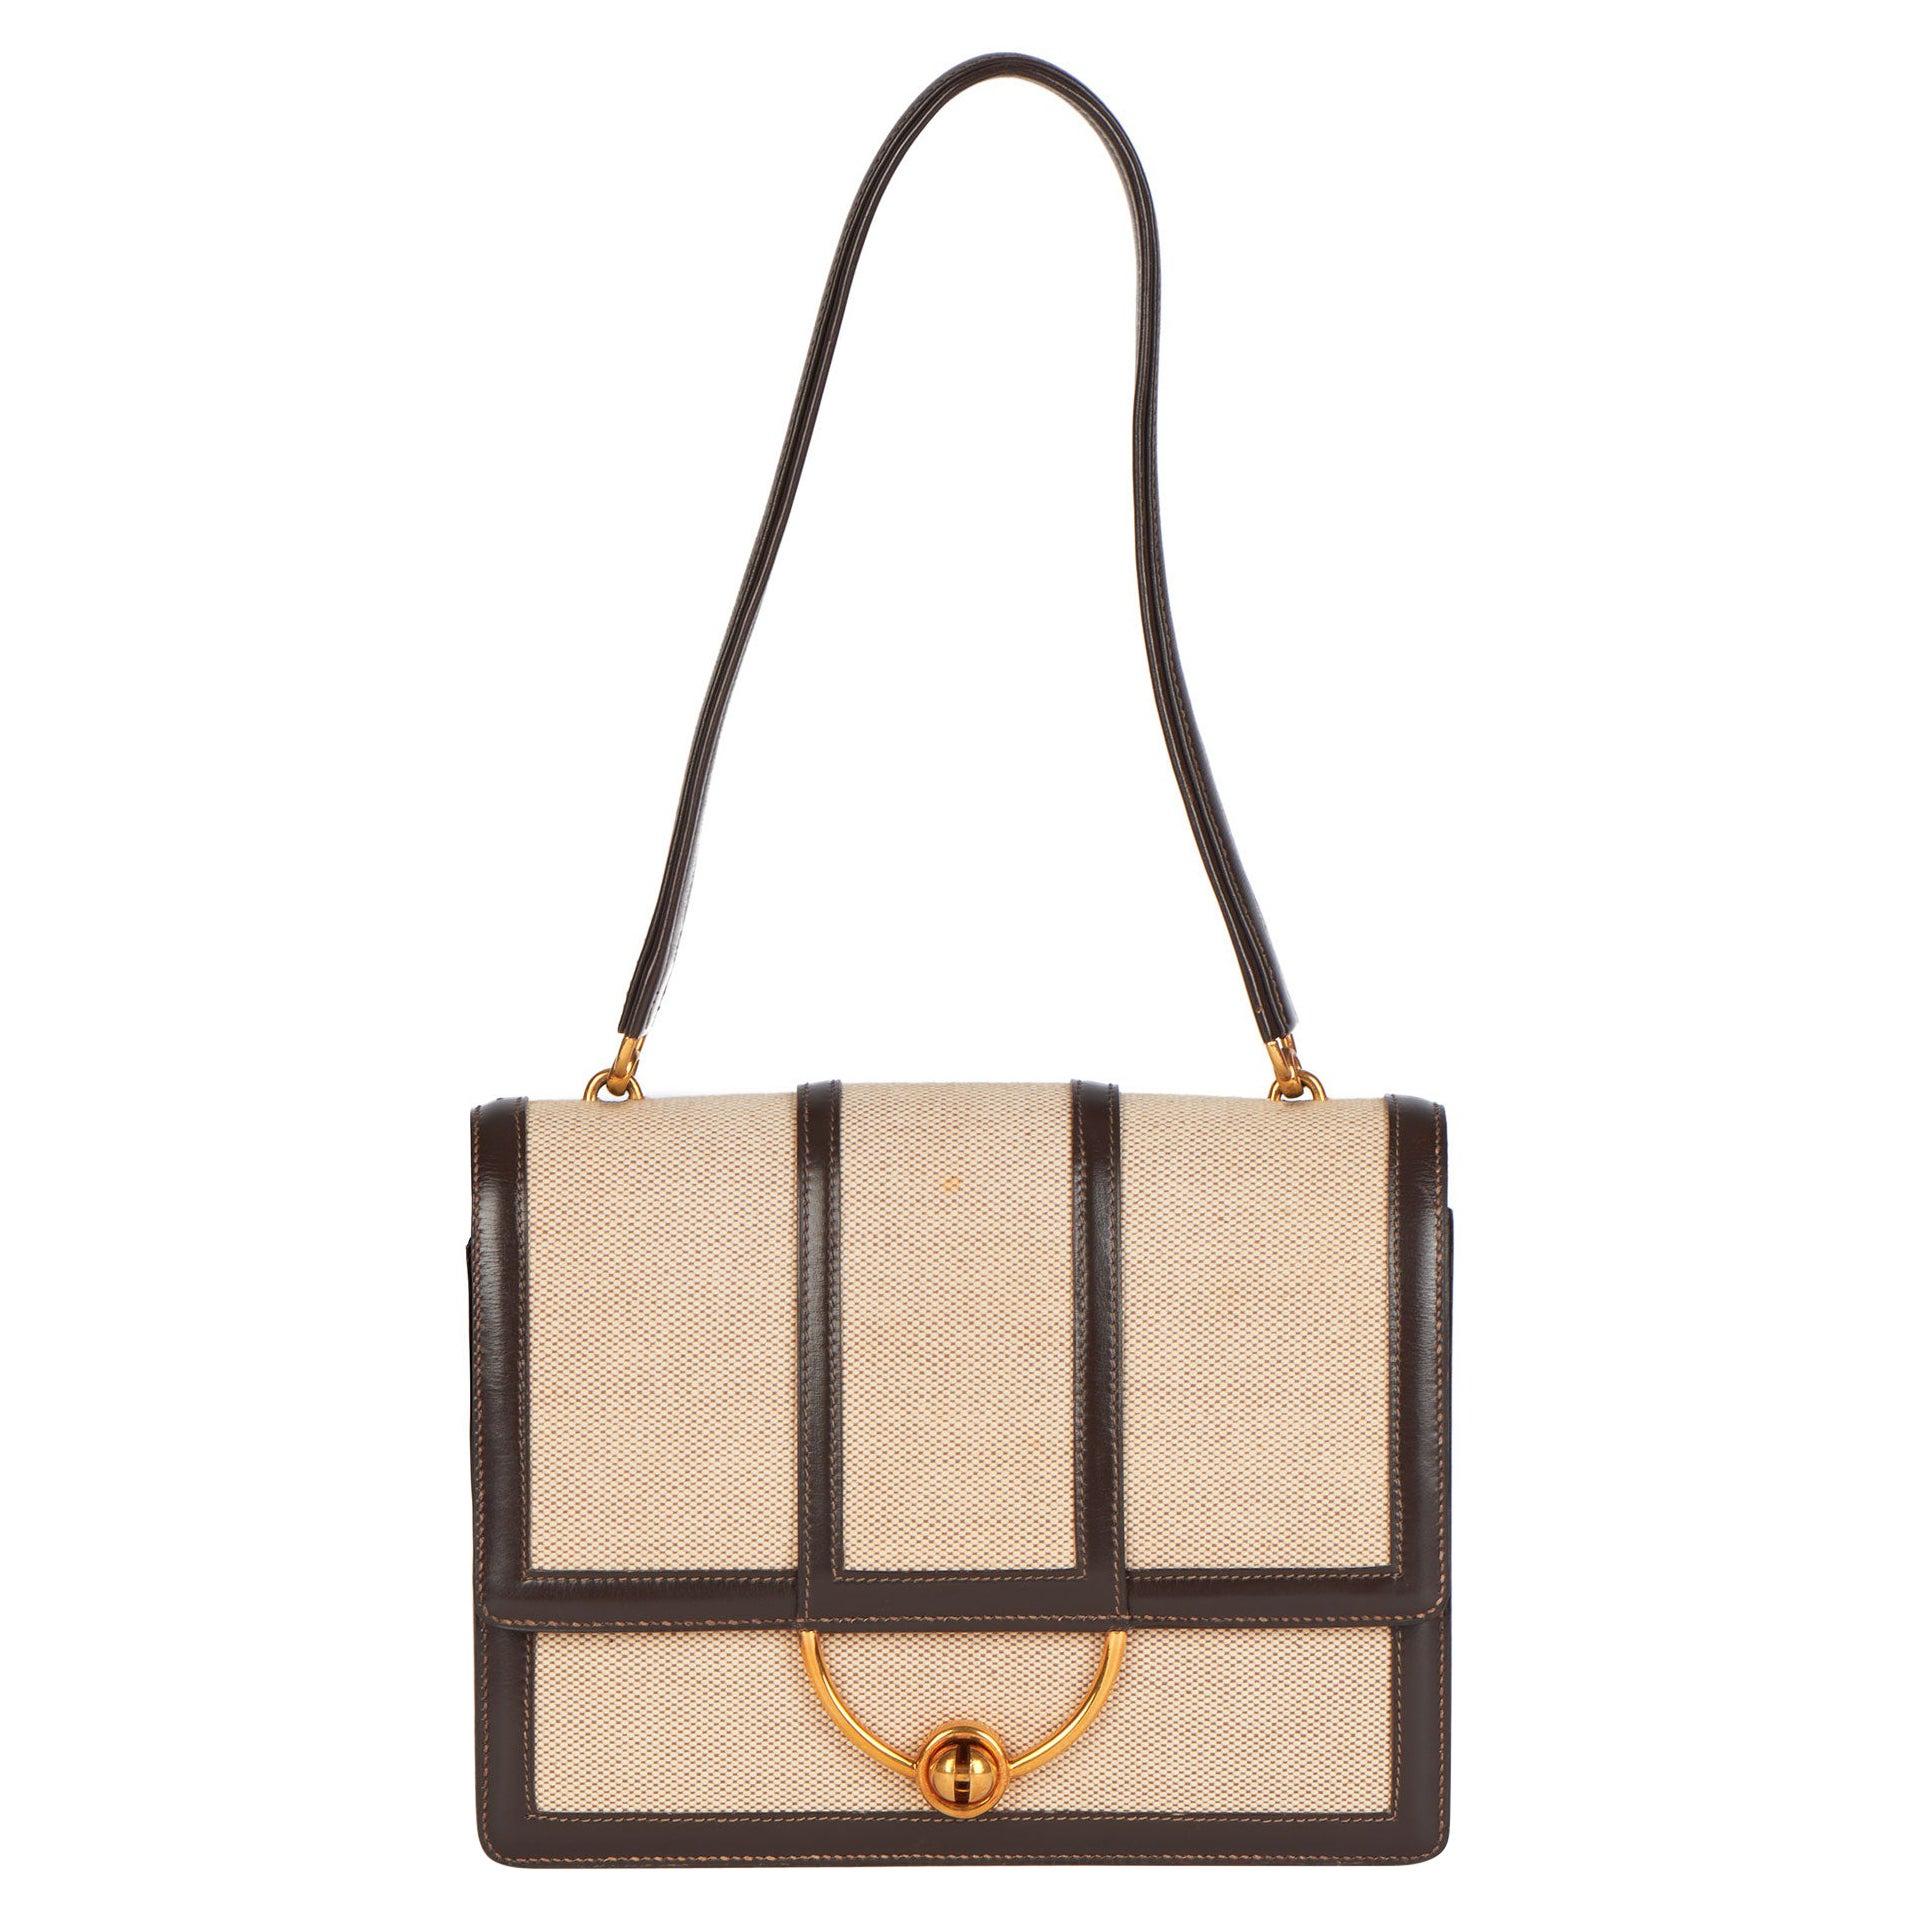 1972 Hermes Brown Box Calf Leather & Beige Canvas Vintage Ring Flap Bag